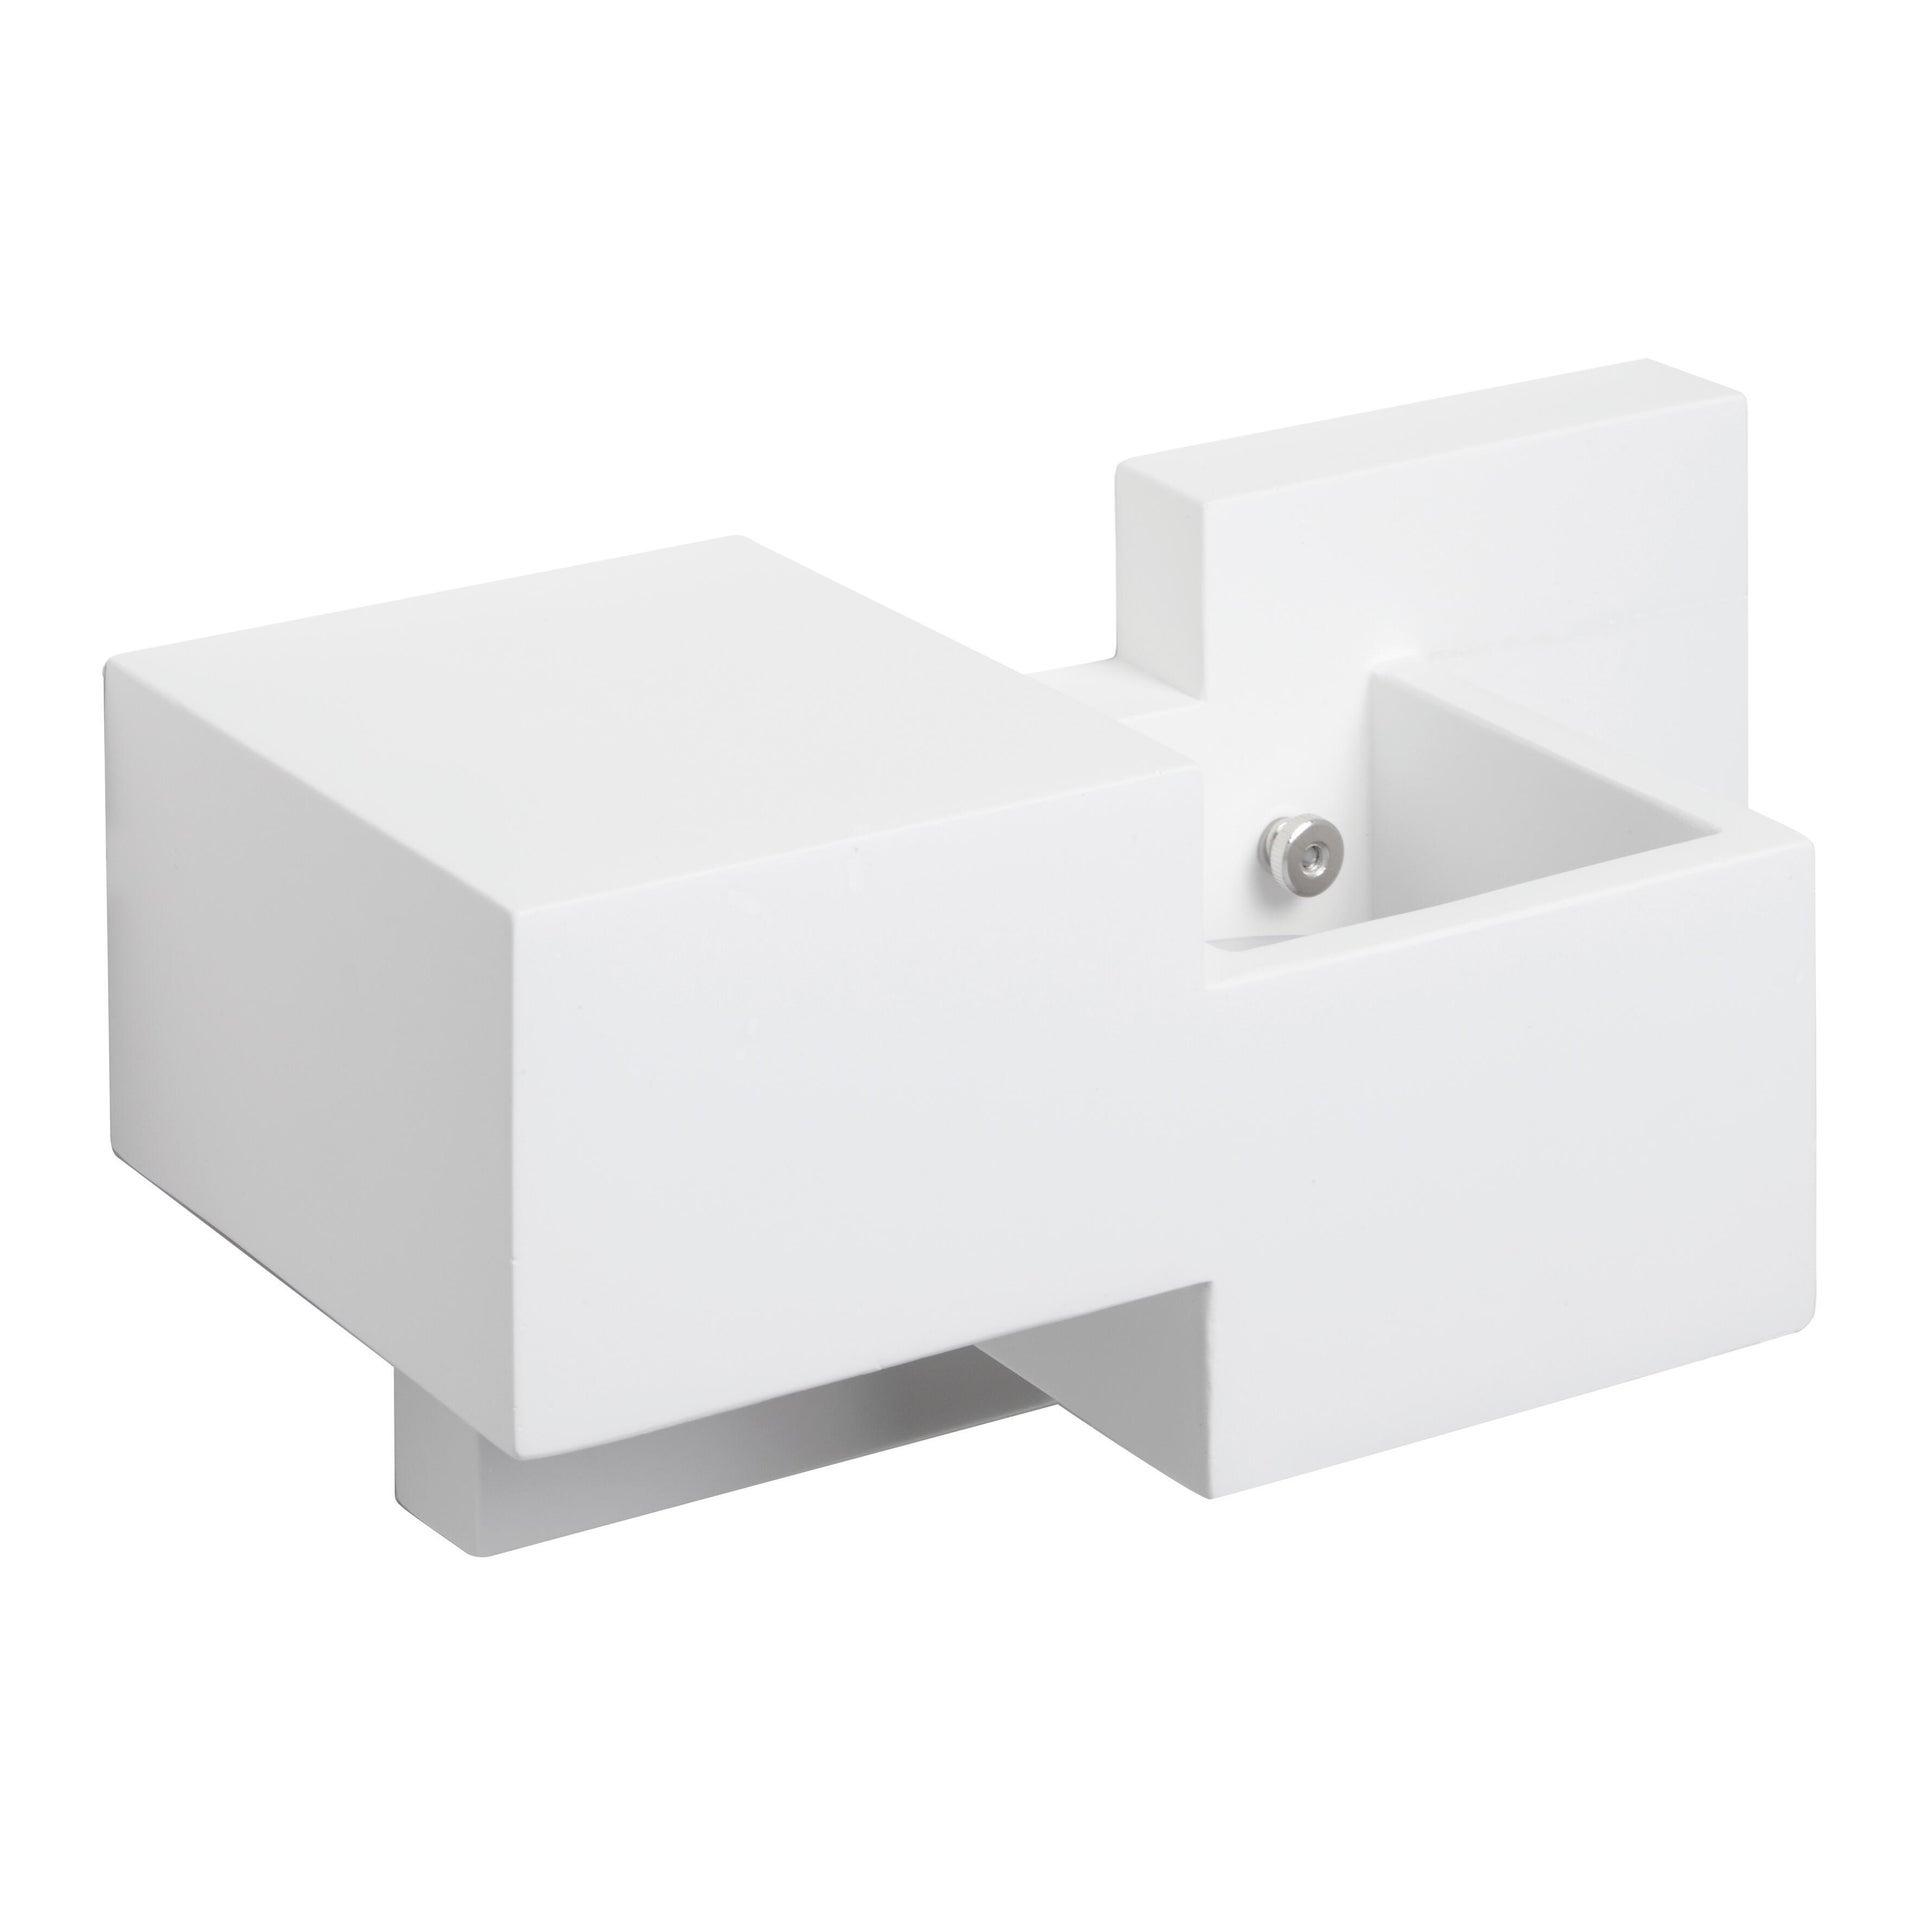 Applique SIDE SMALL bianco, in gesso, 2 luci - 11